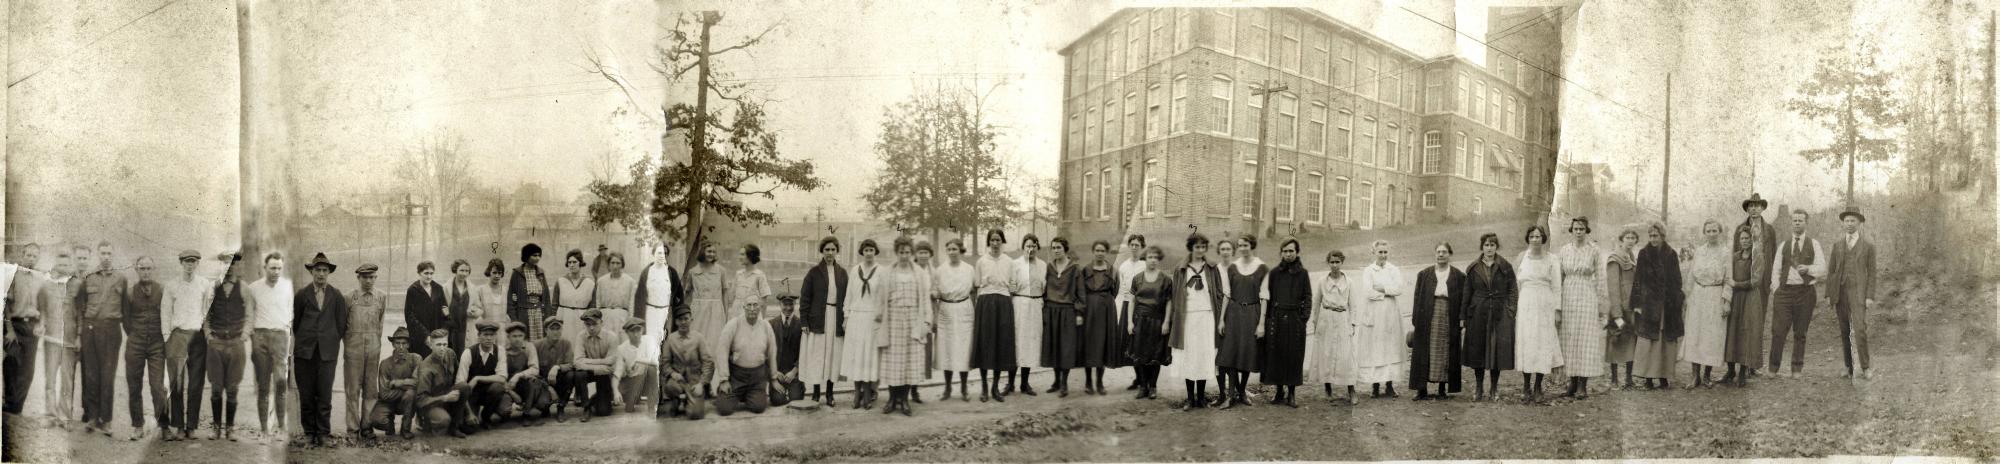 Lillian Mill Panoramic Photograph